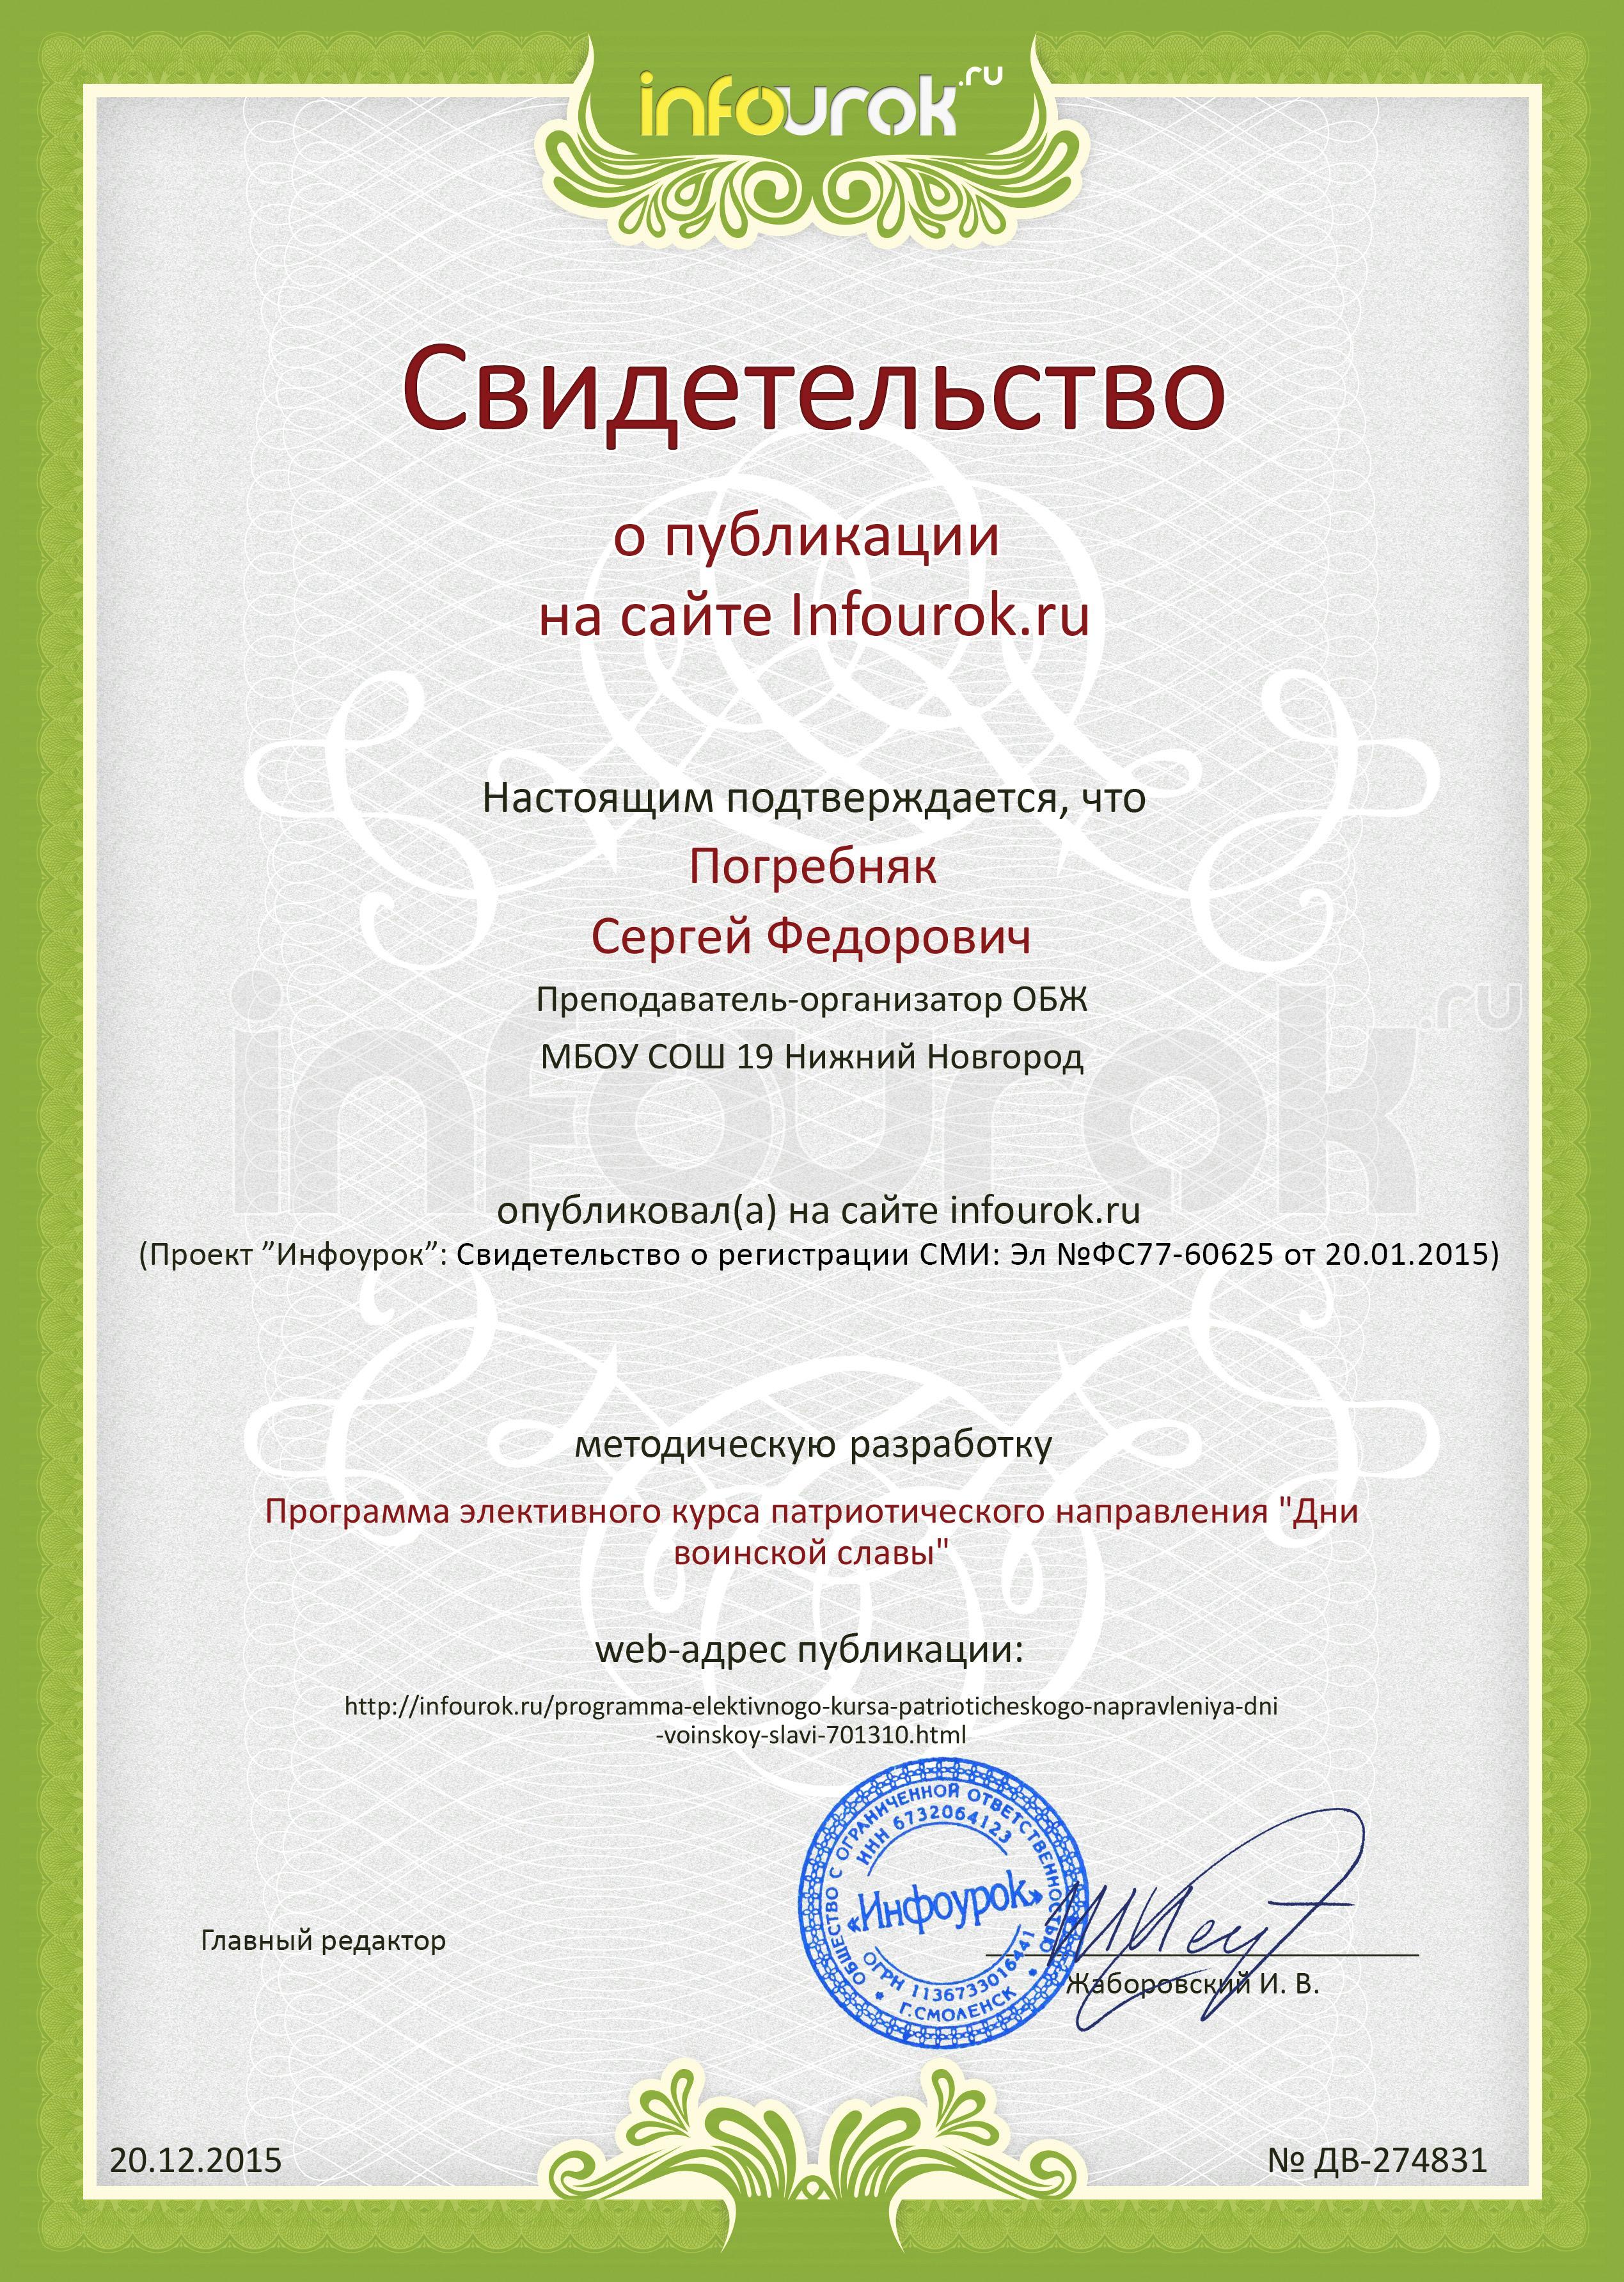 Сертификат проекта infourok.ru № ДВ-274831.jpg